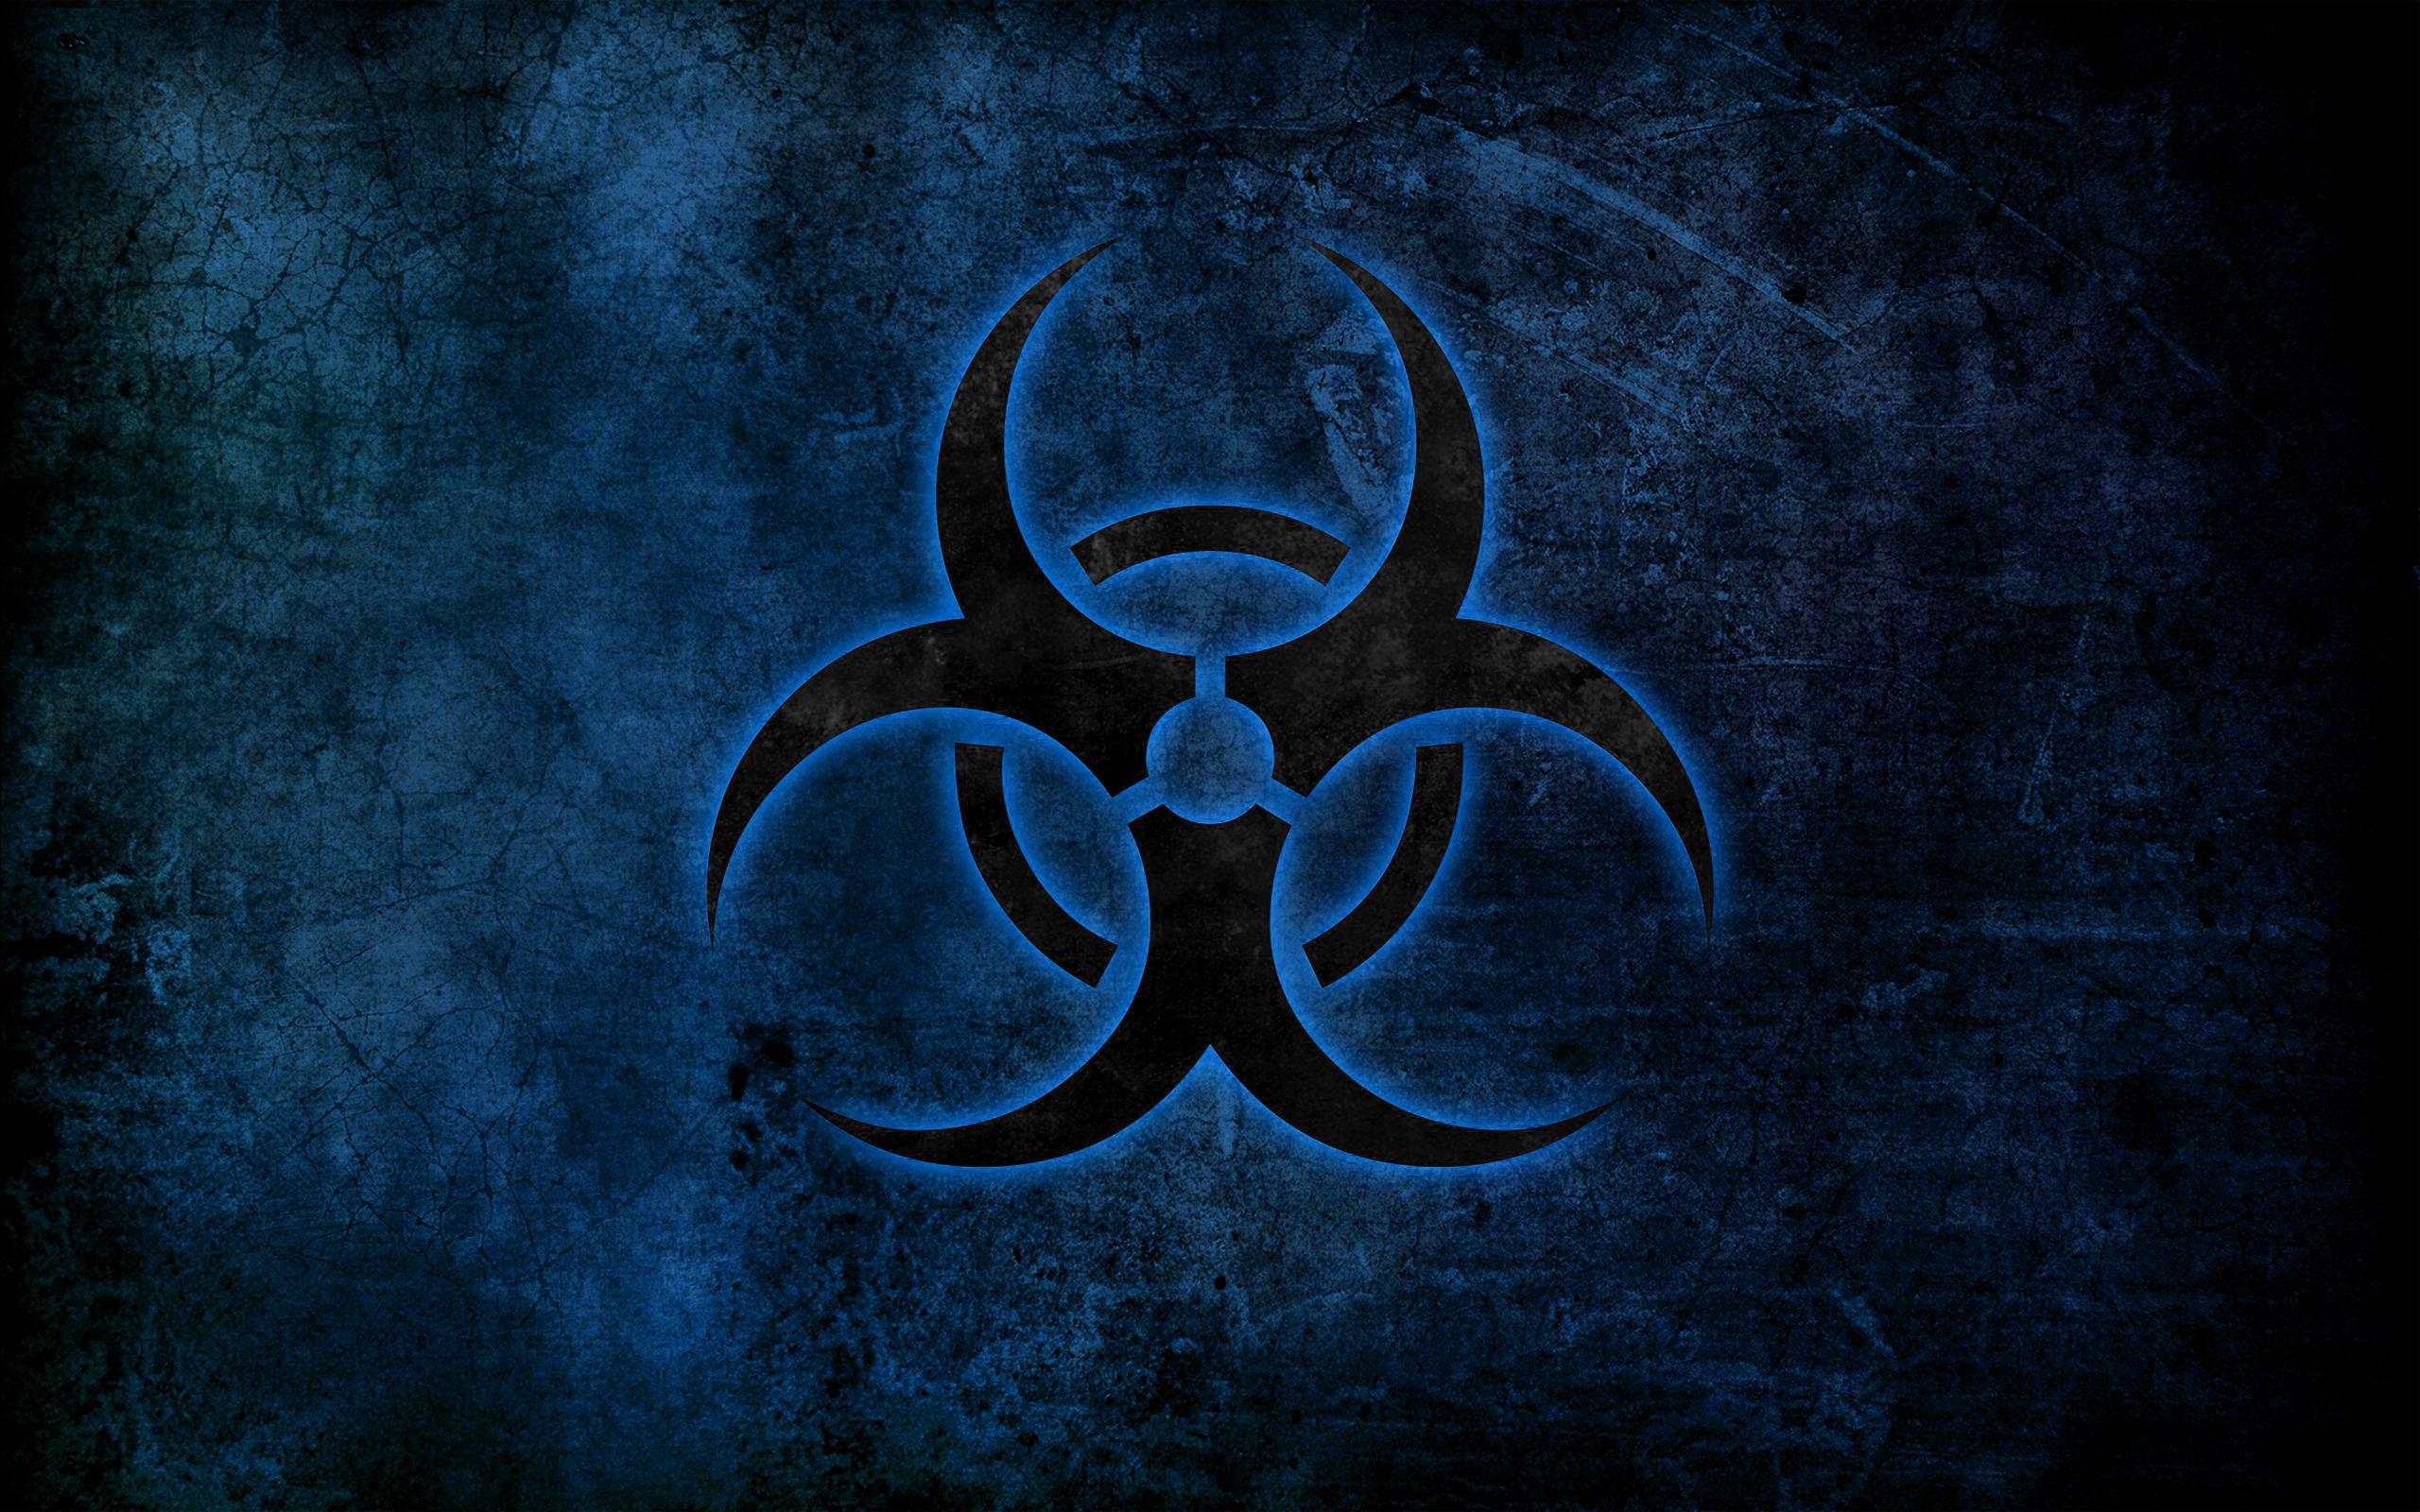 Pics Photos   Biohazard Symbol Wallpaper 2560x1600